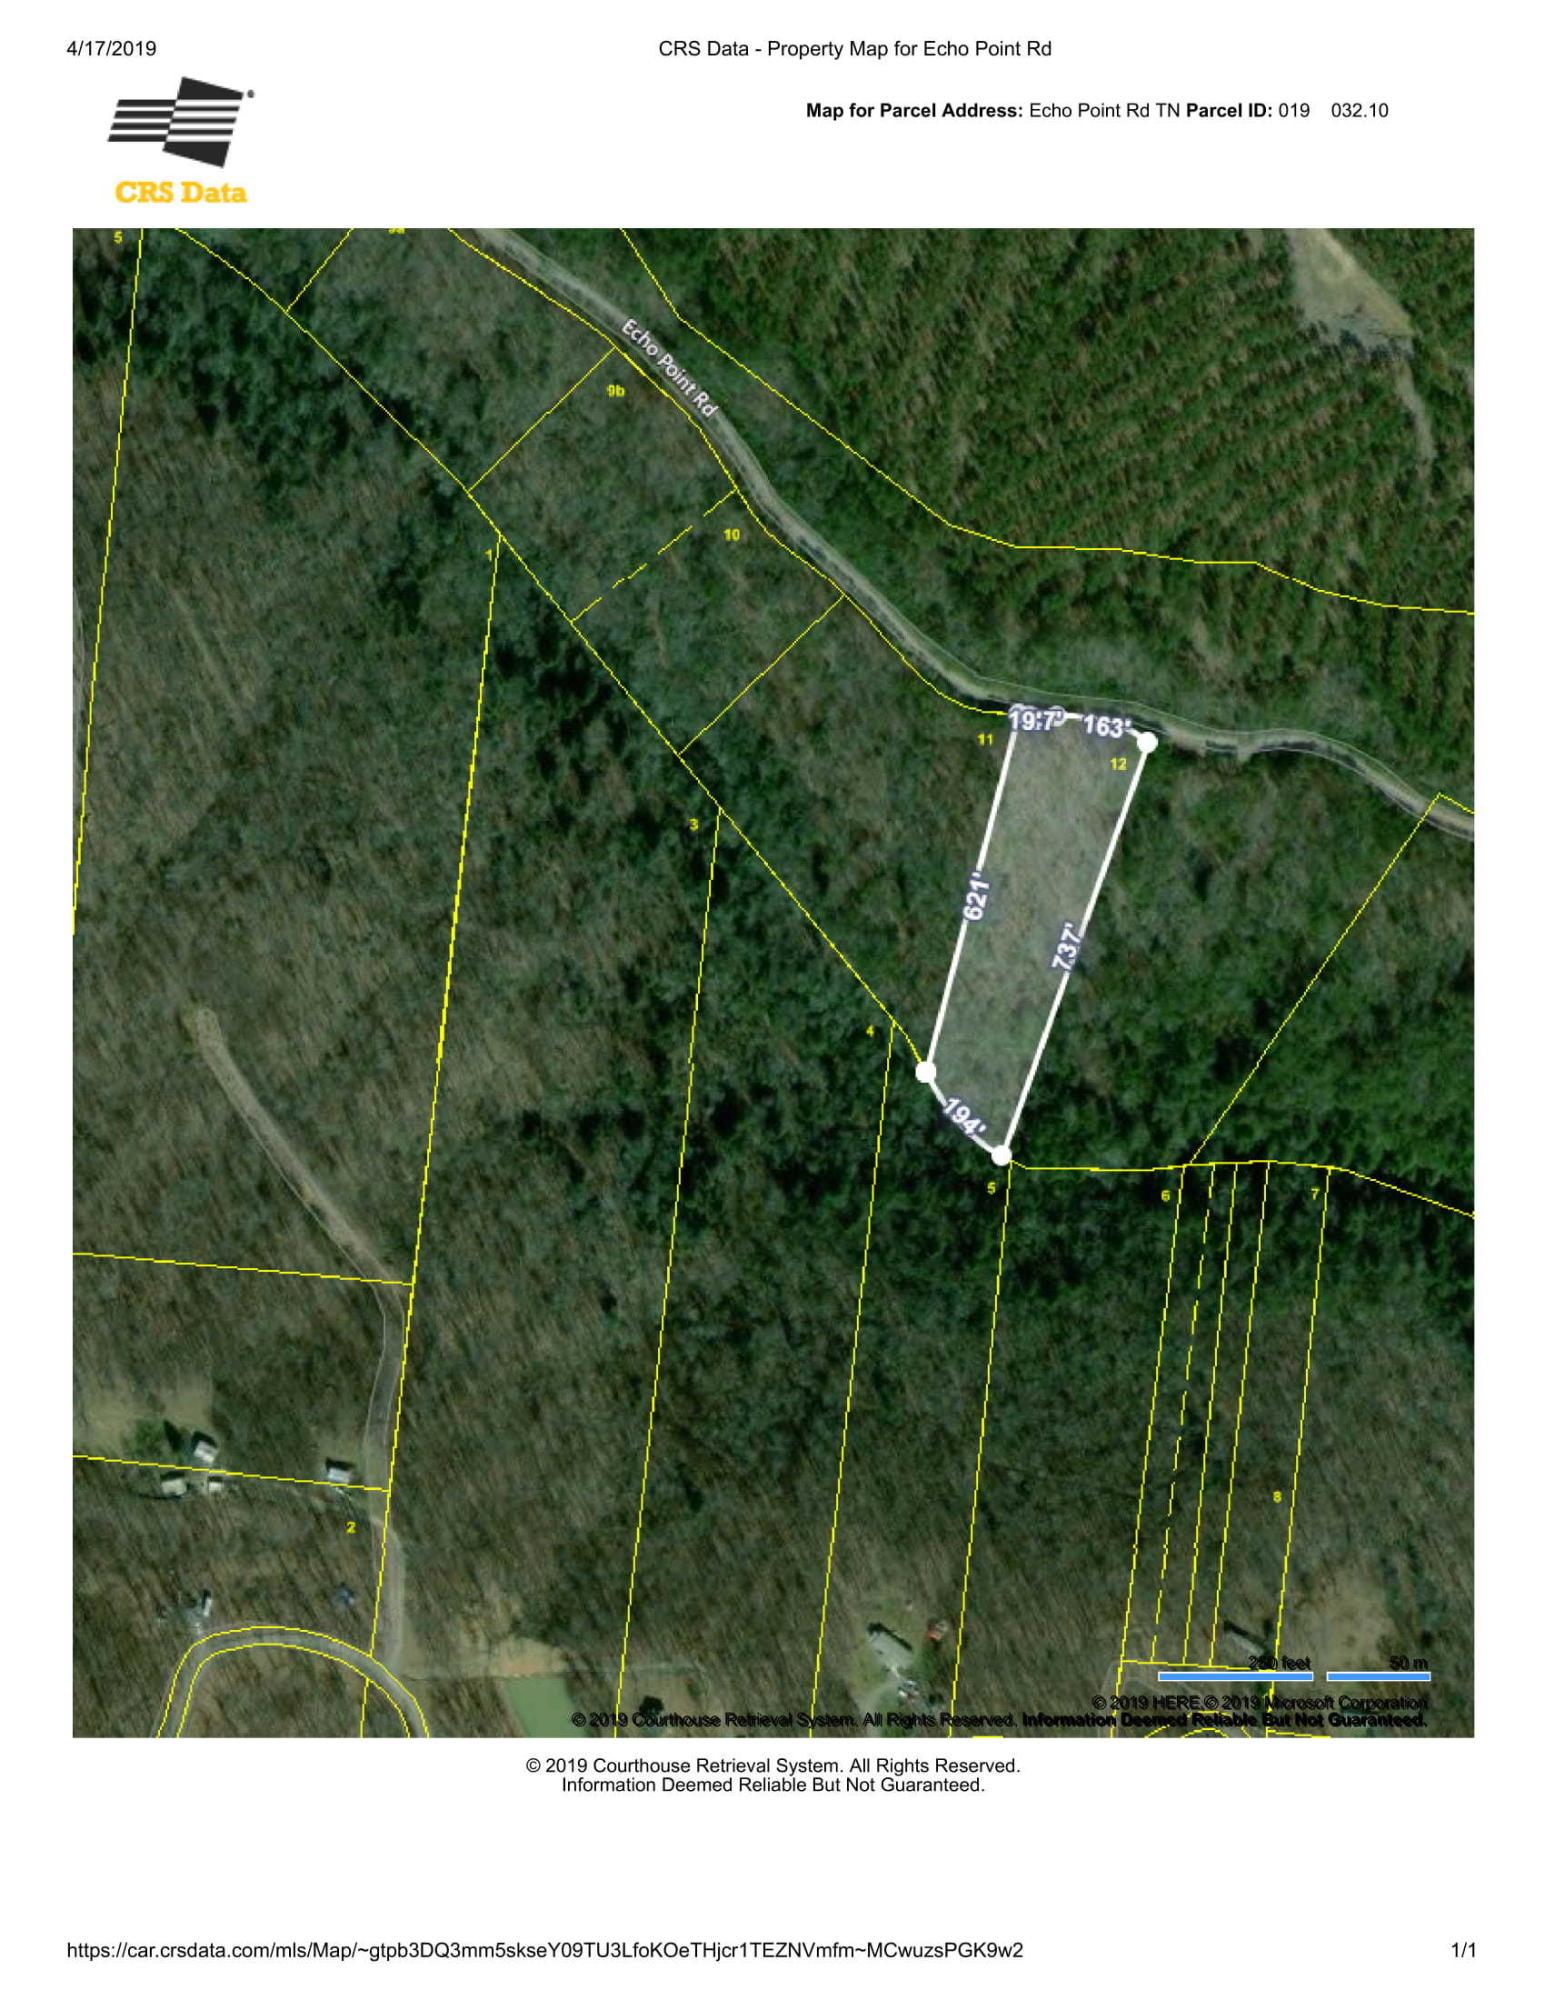 12 Echo Point Rd, Dunlap, TN 37327